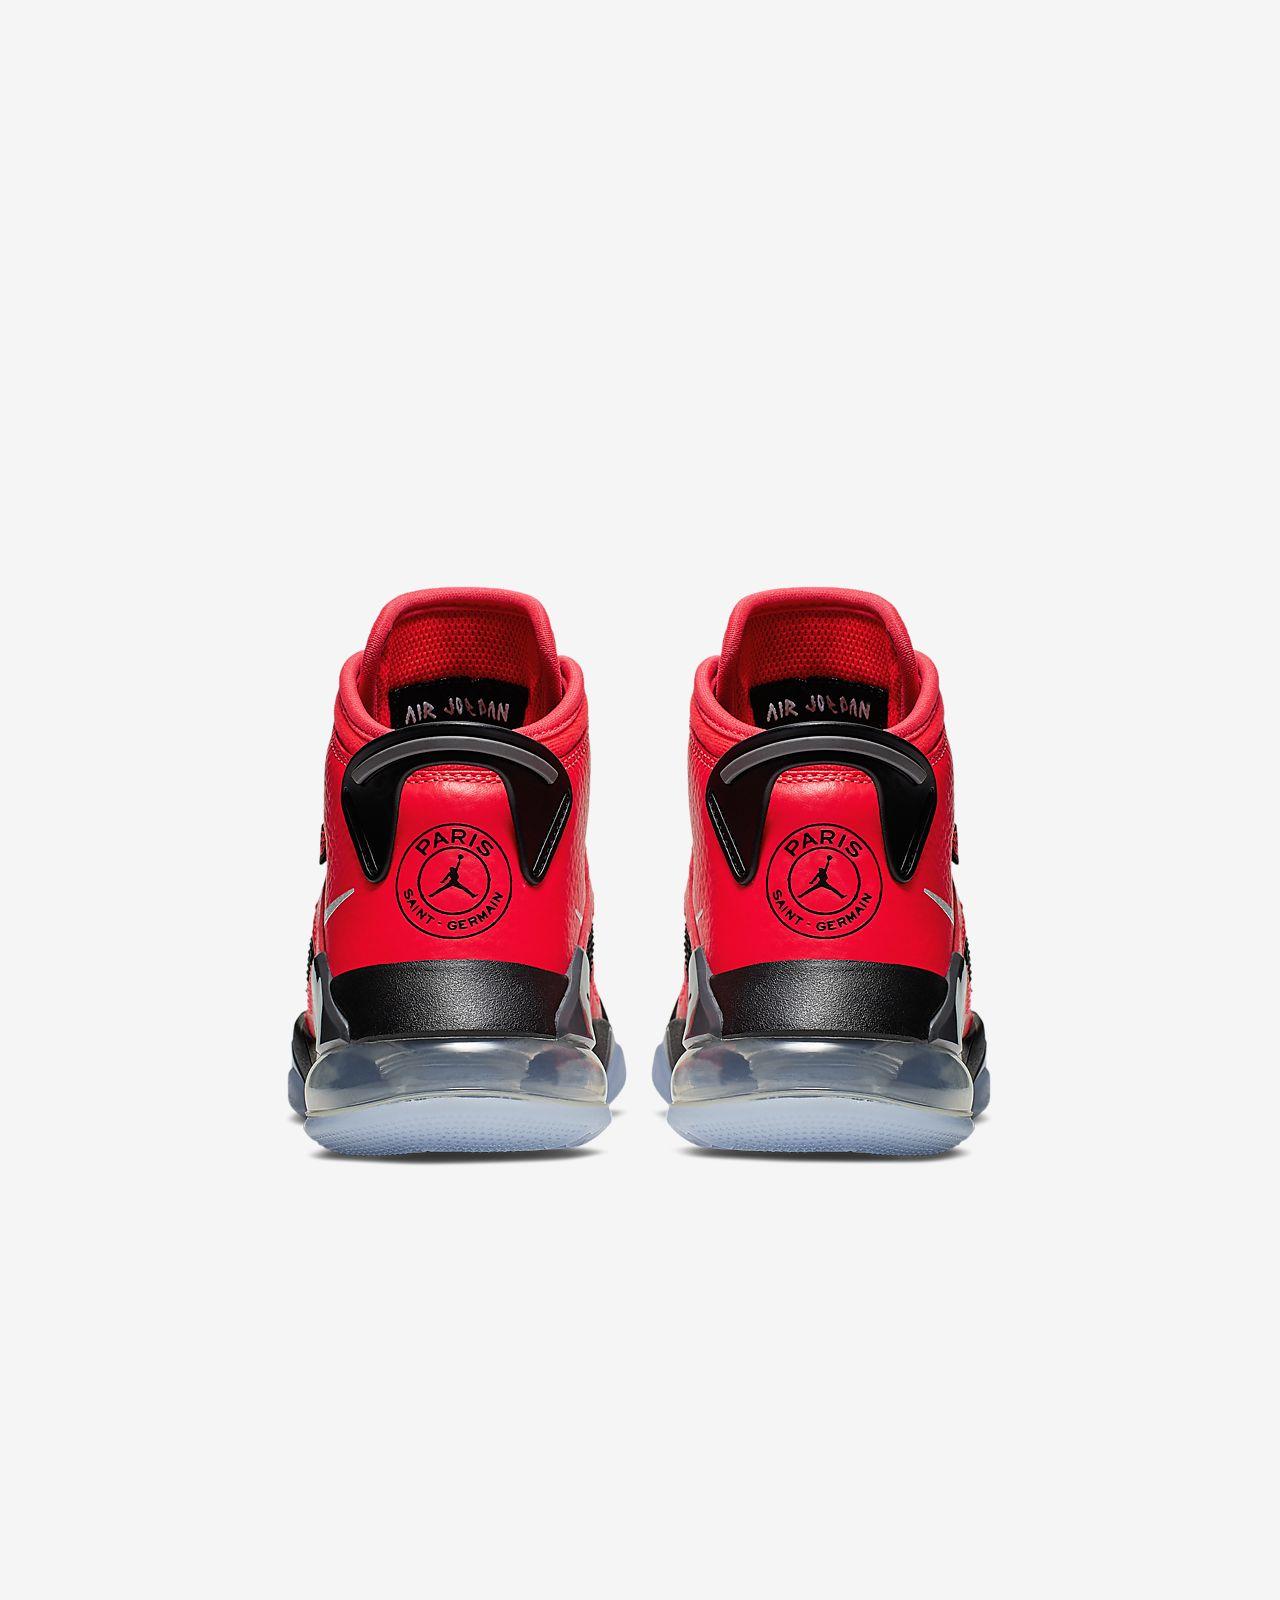 Mars Saint Germain Jordan 270 Big Kids'Boys'Shoe Paris Y6b7yfvg